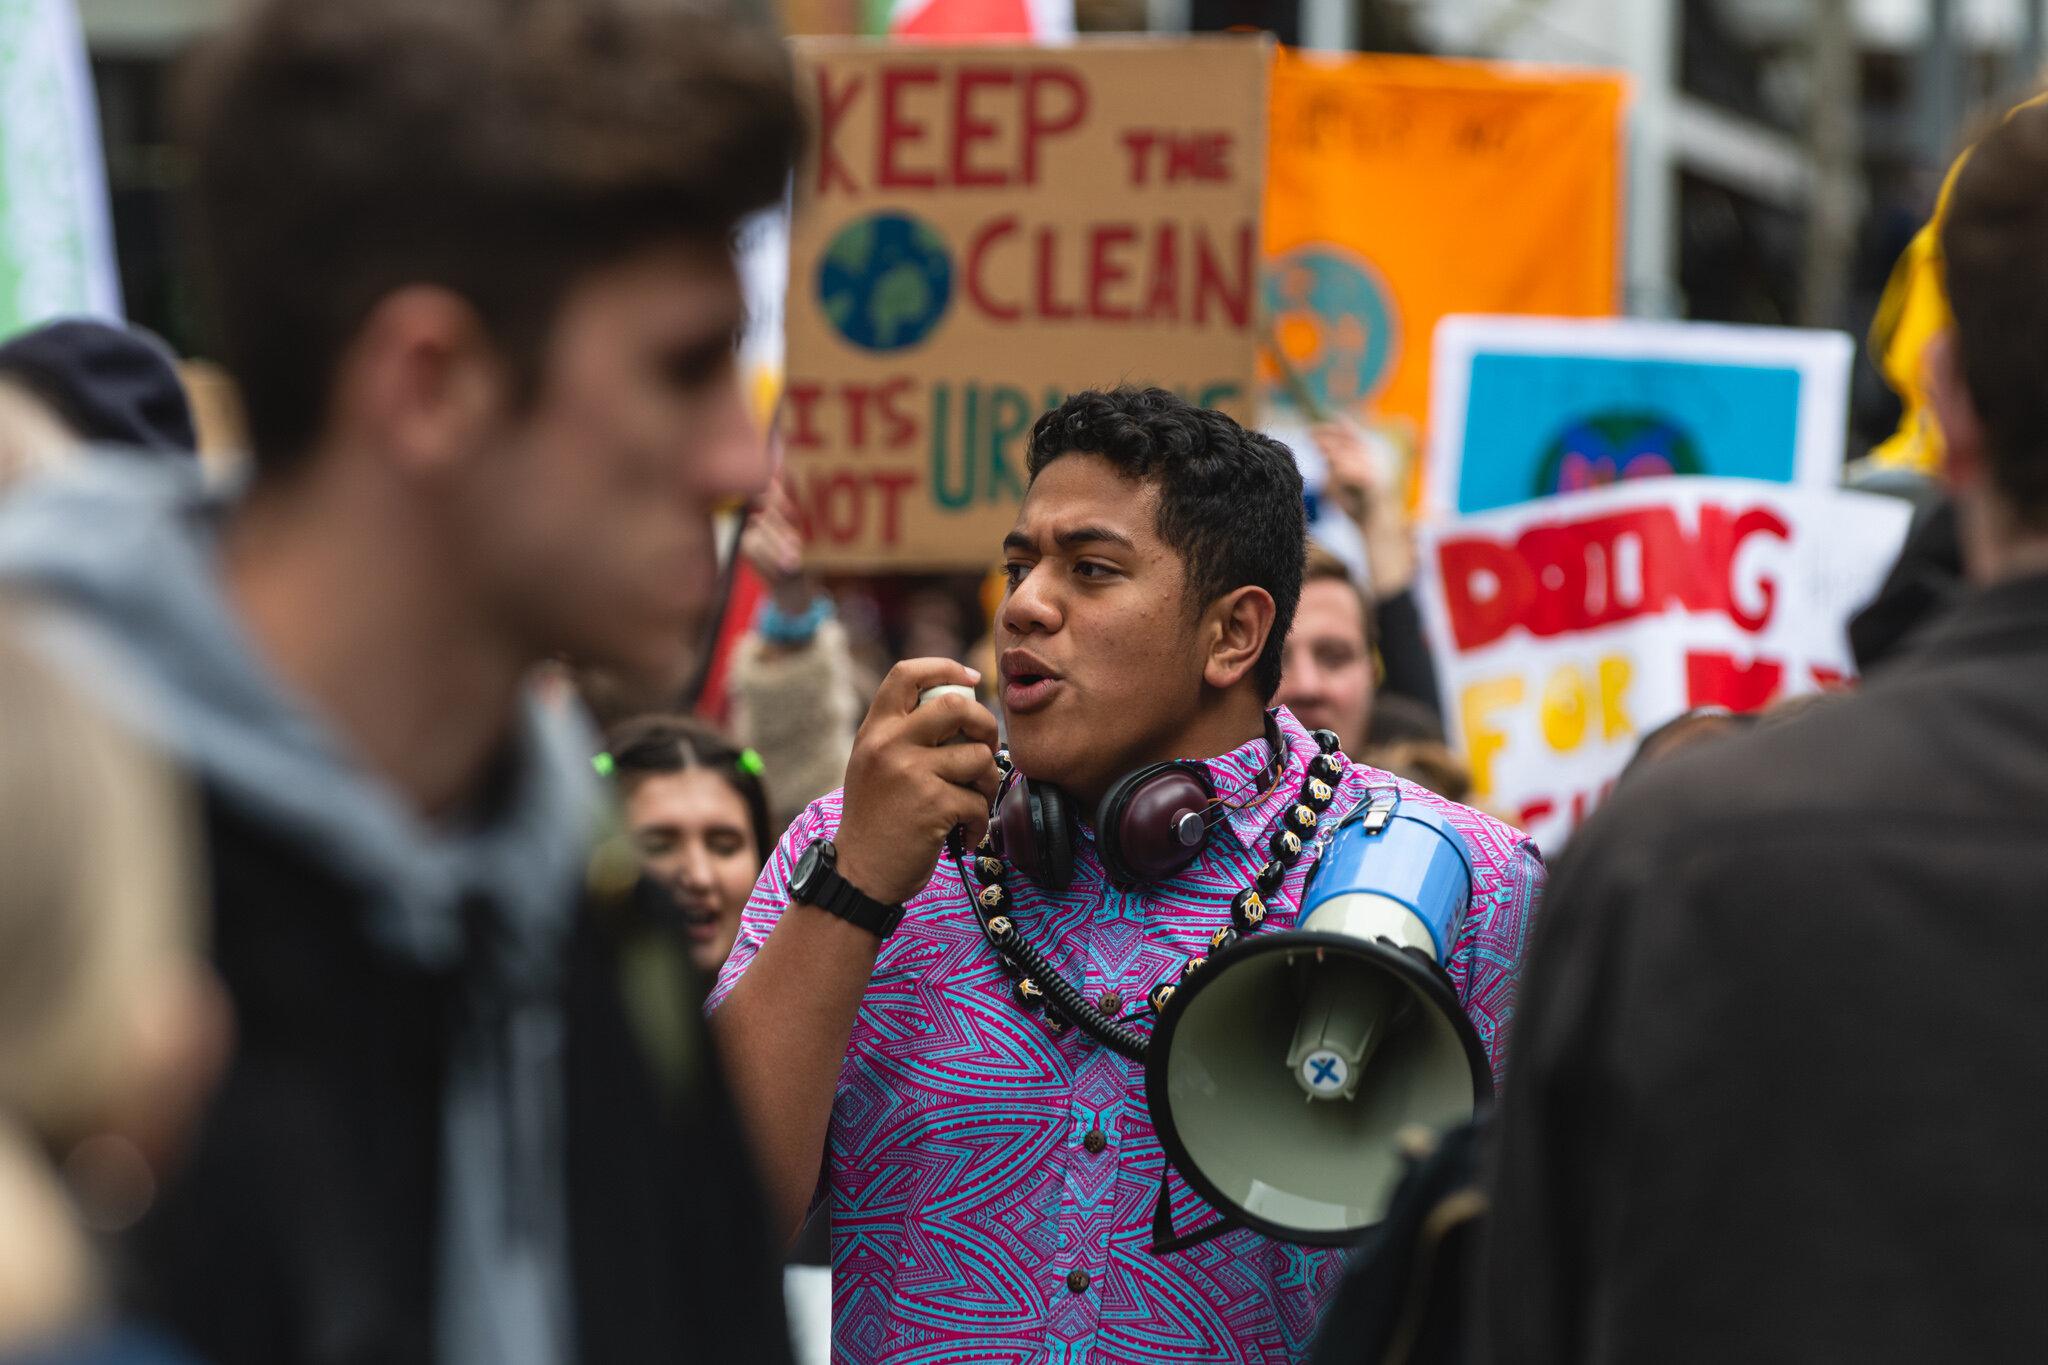 2019 09 27 Climate Demo-197.jpg